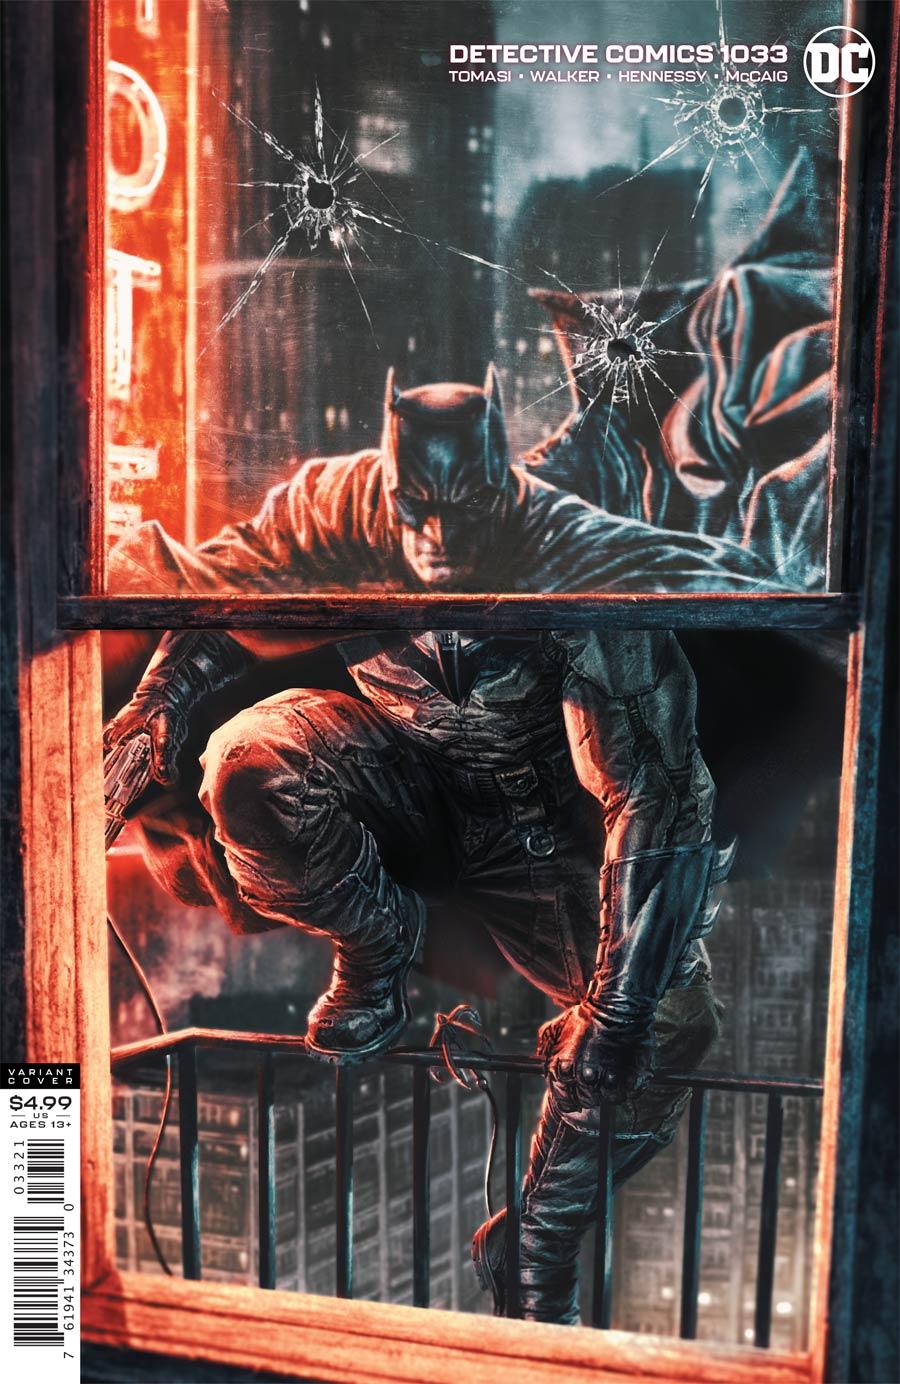 Detective Comics Vol 2 #1033 Cover B Variant Lee Bermejo Card Stock Cover